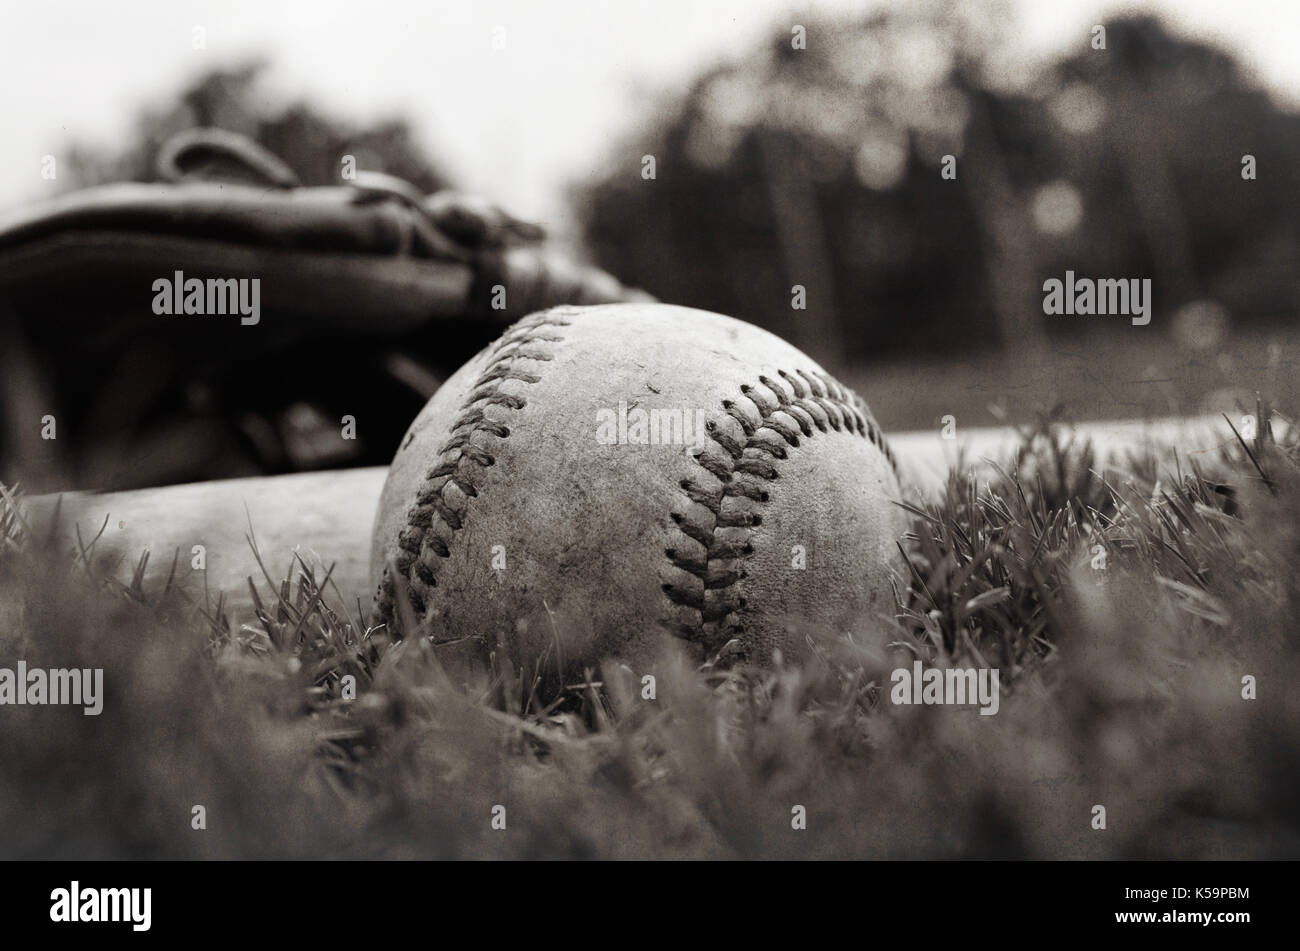 Softball glove and ball black and white